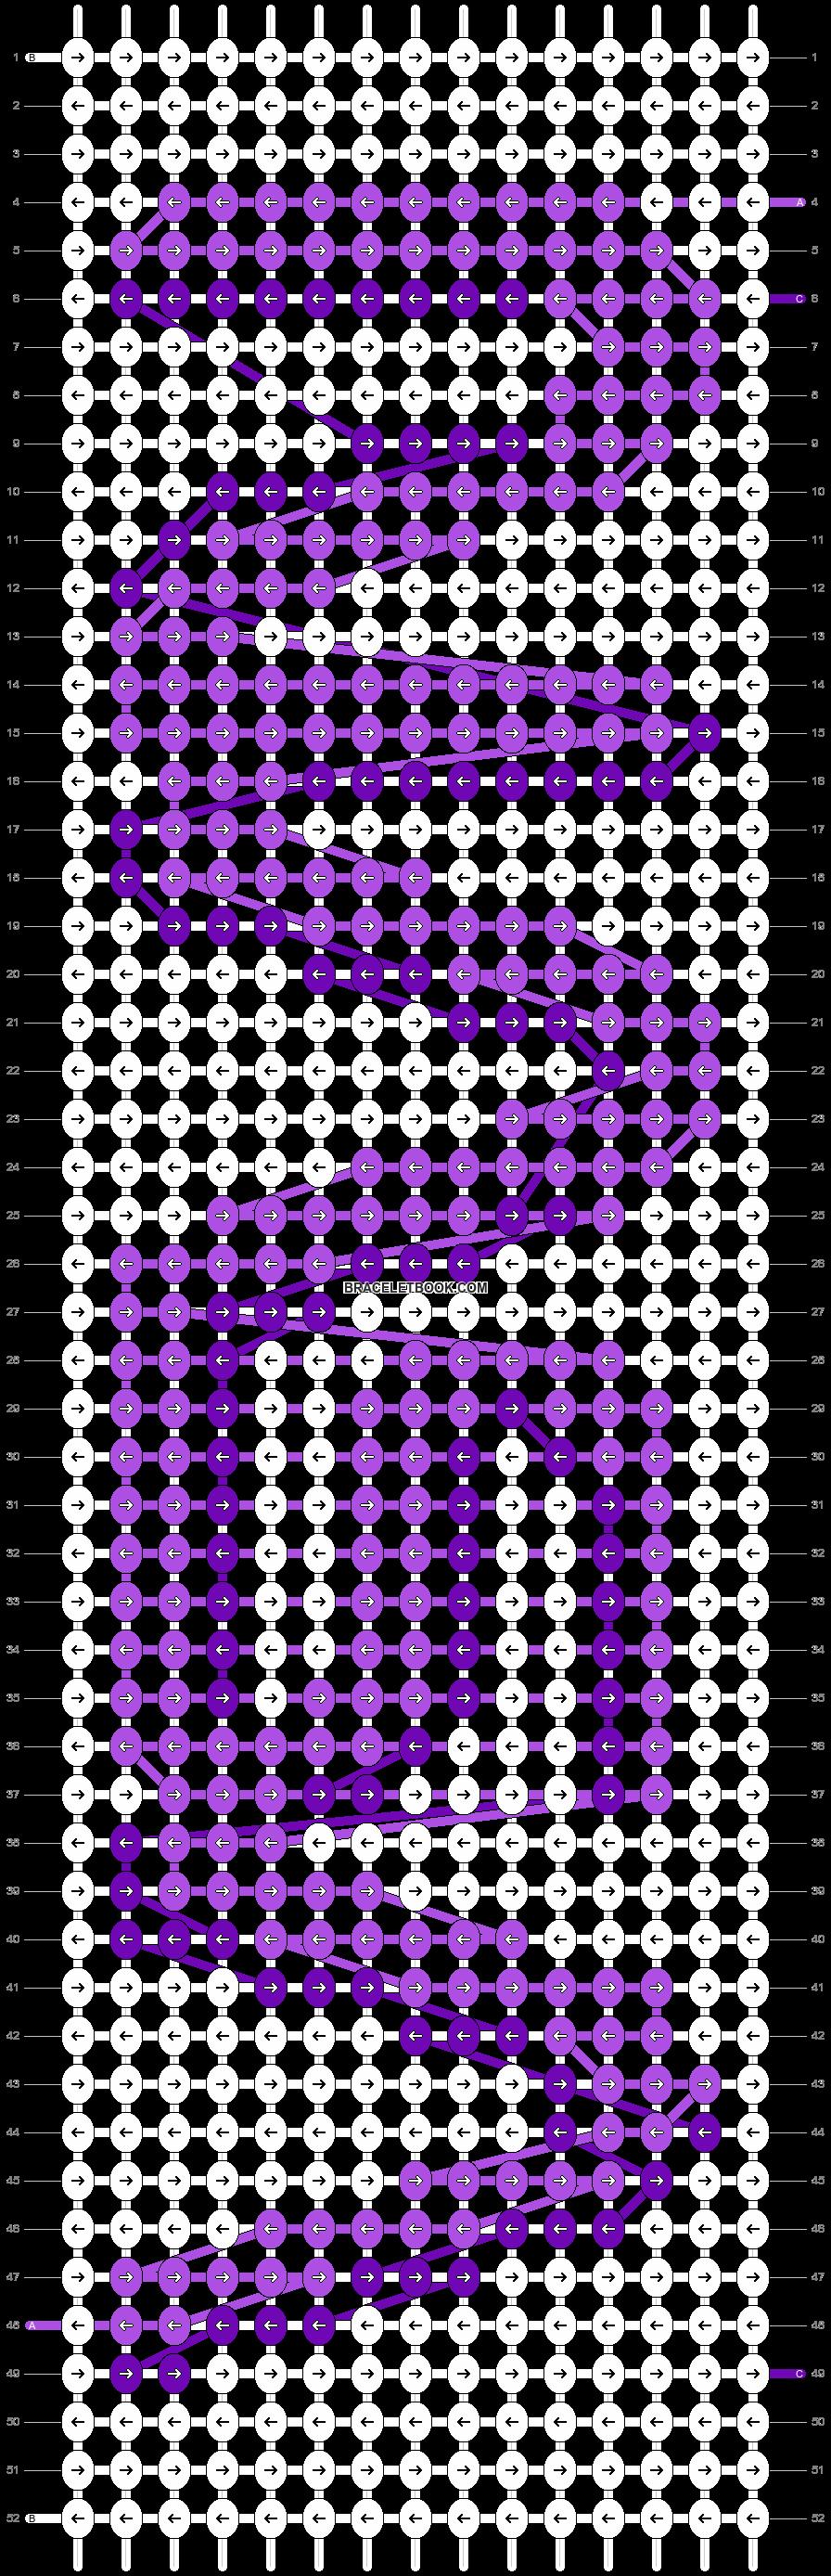 Alpha pattern #57624 variation #100774 pattern